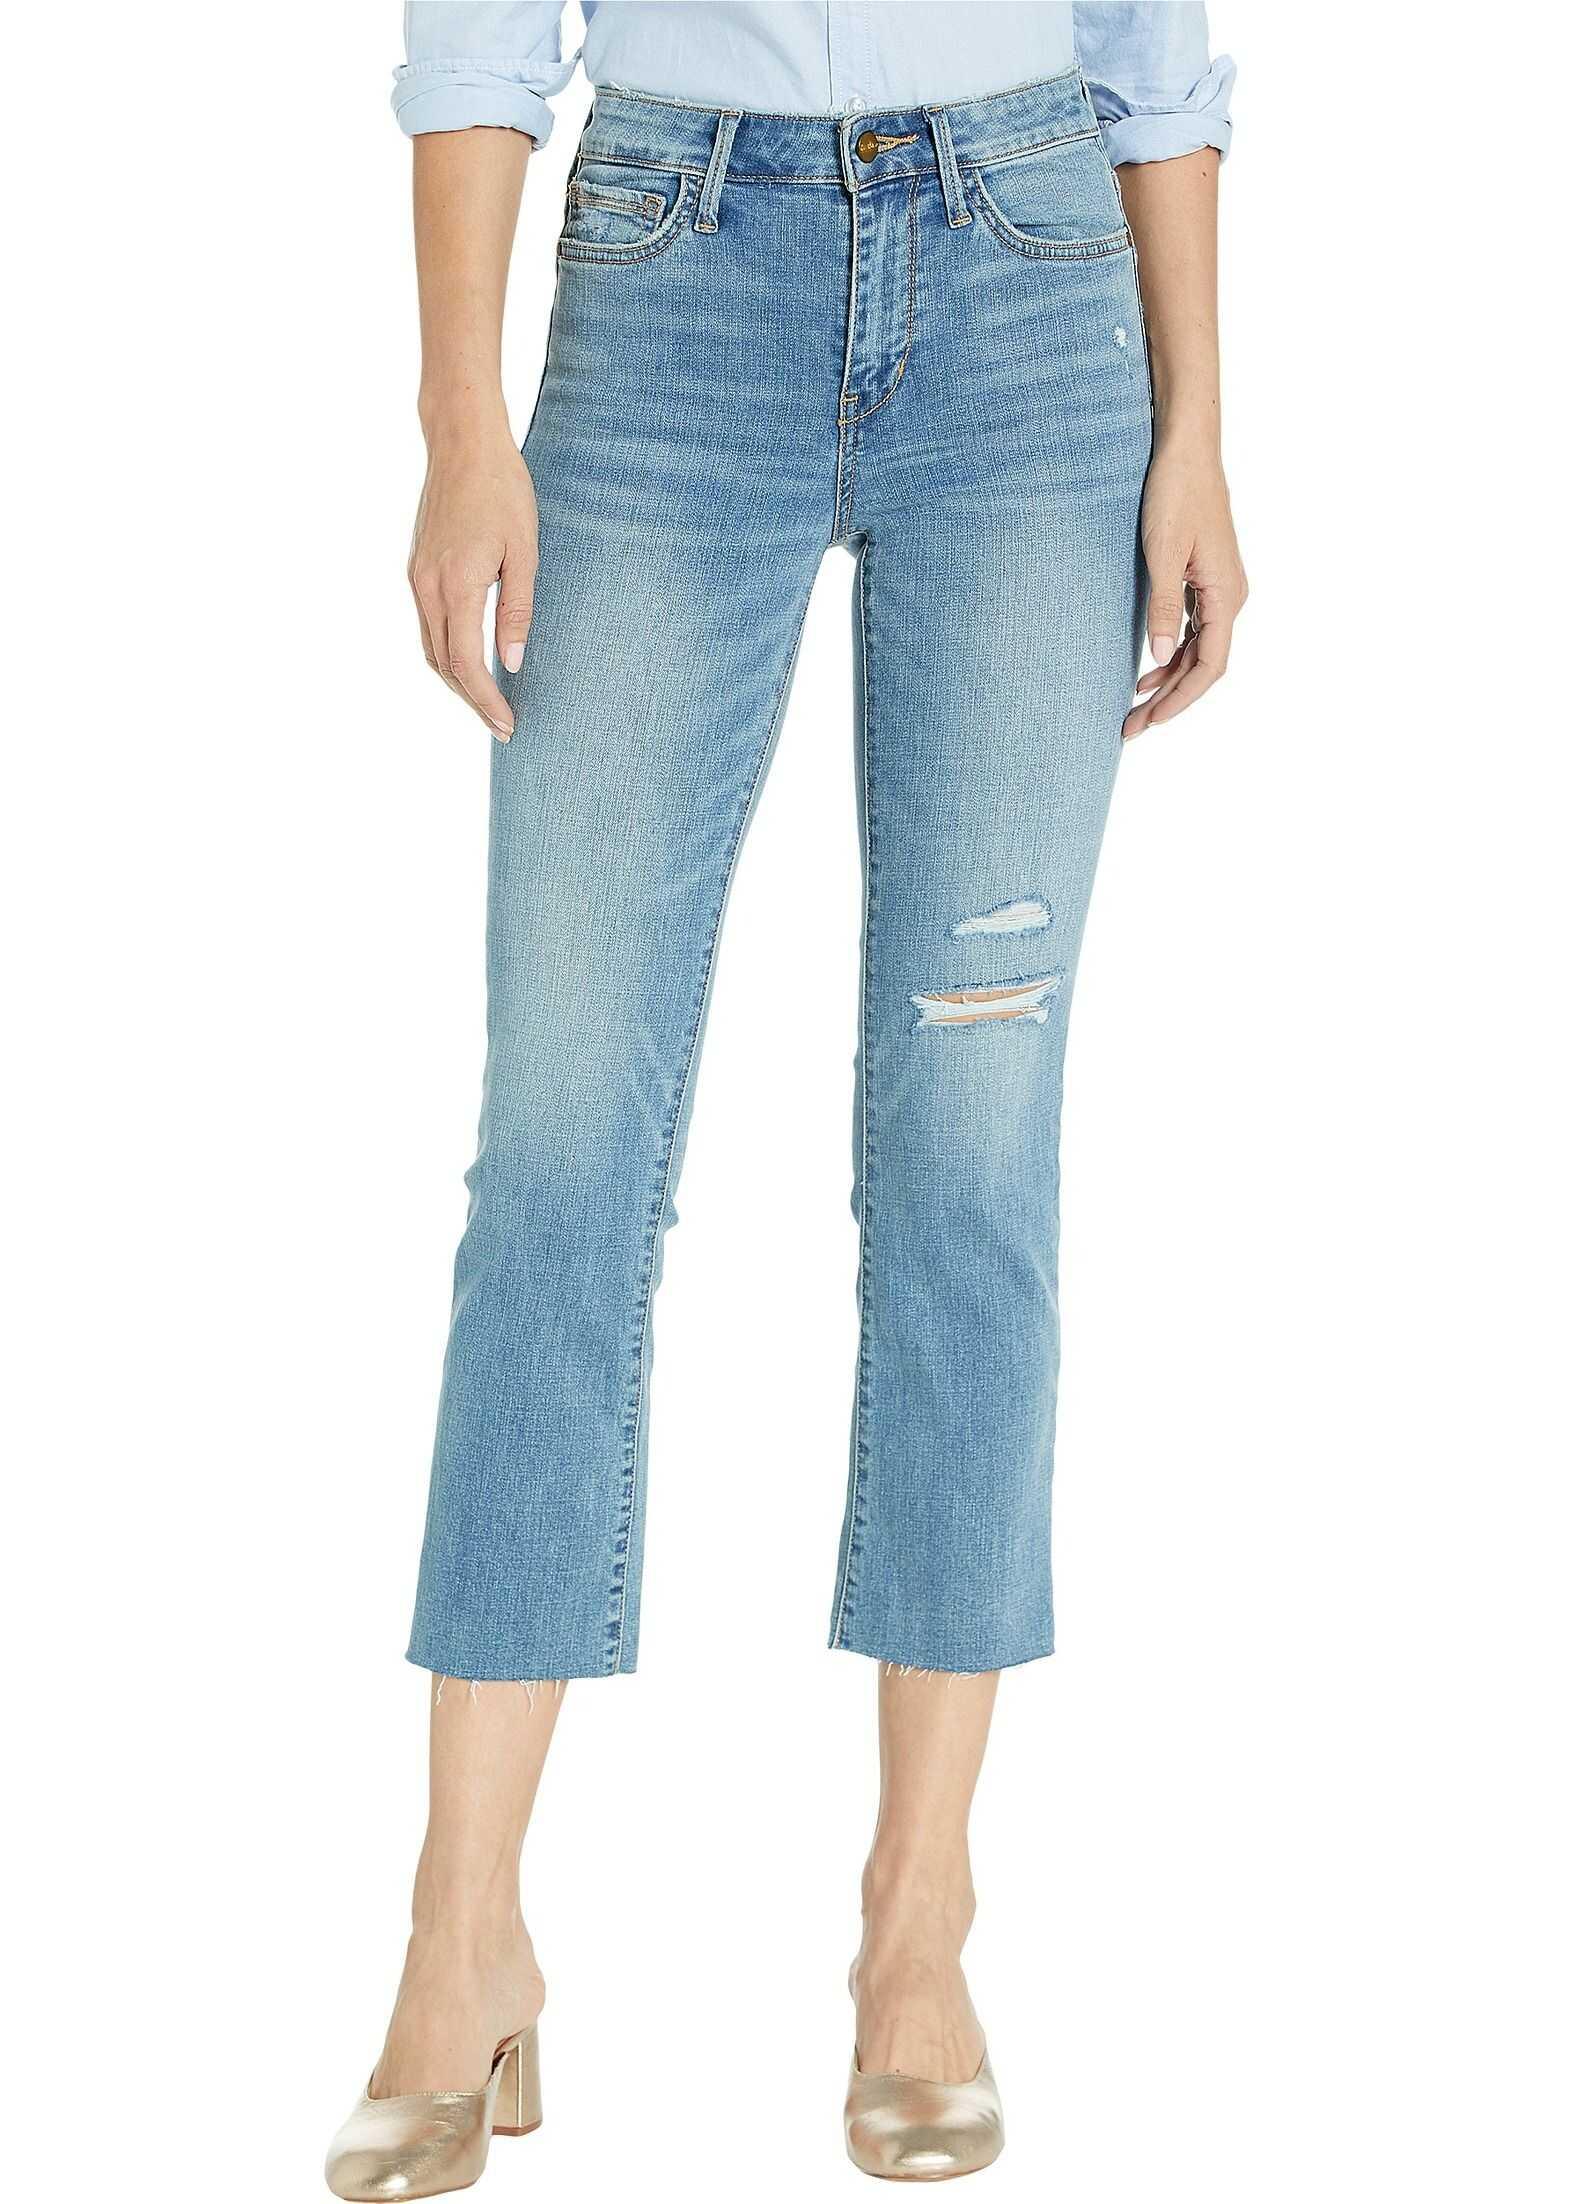 Sam Edelman Stiletto Crop Boot Jeans in Olien Olien